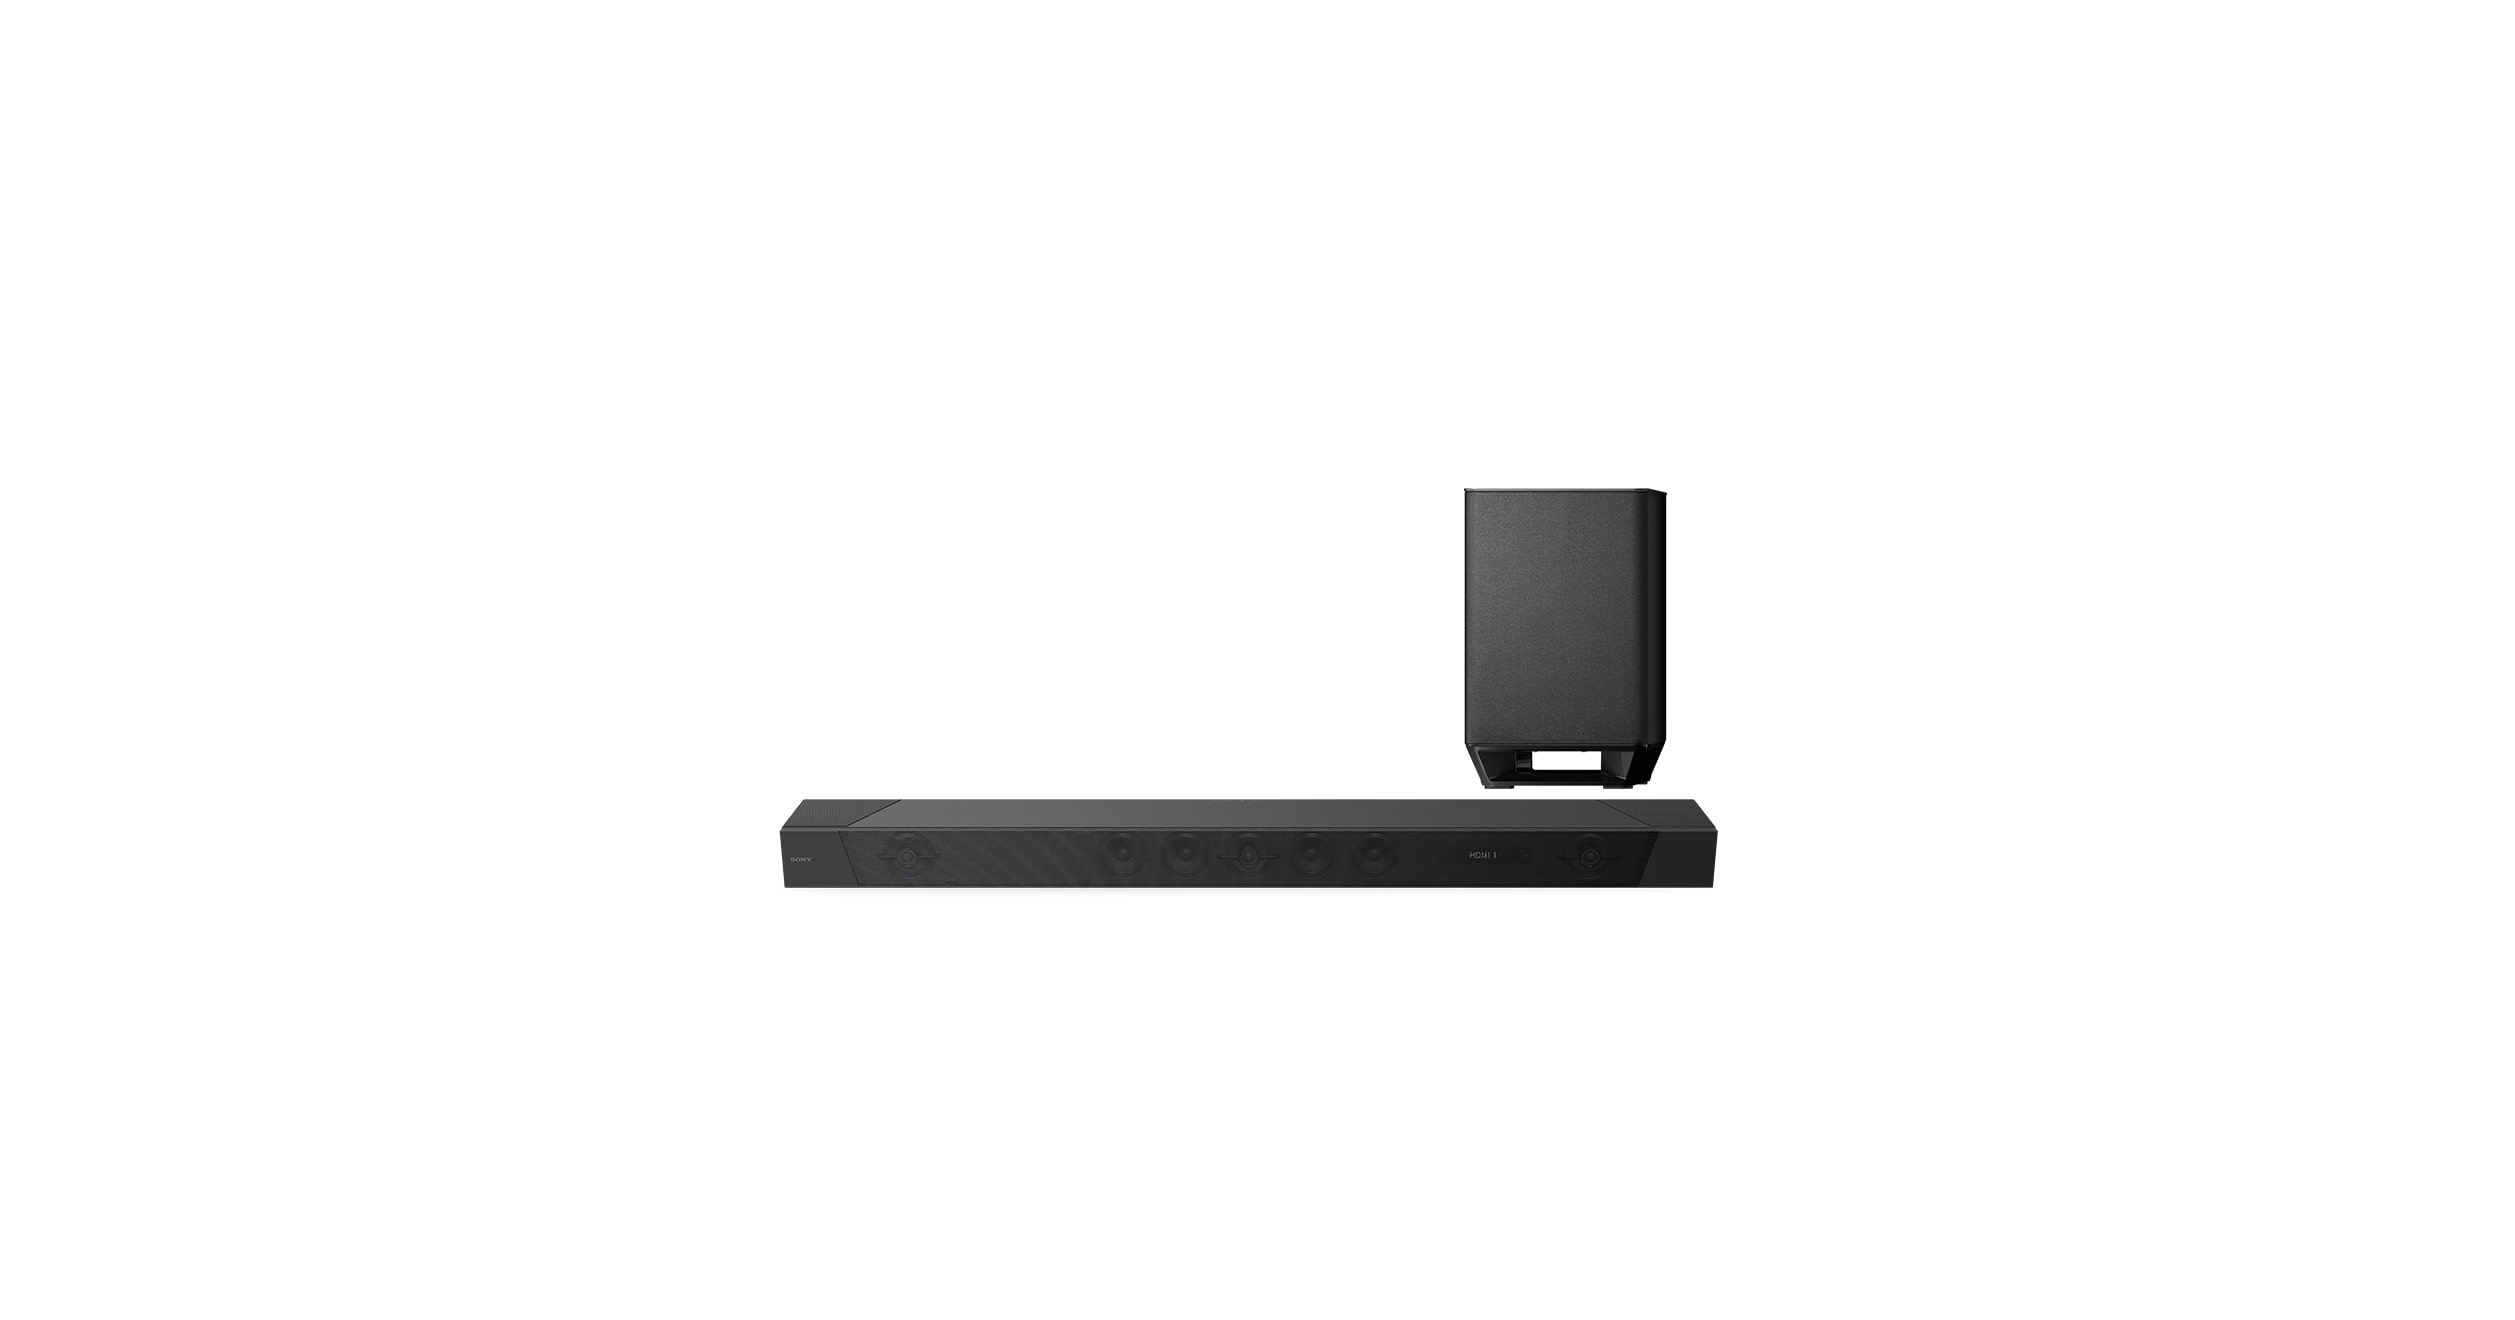 Sony 7 1 2ch Dolby Atmos/DTS:X TM Soundbar with Wi-Fi/Bluetooth technology   HT-ST5000